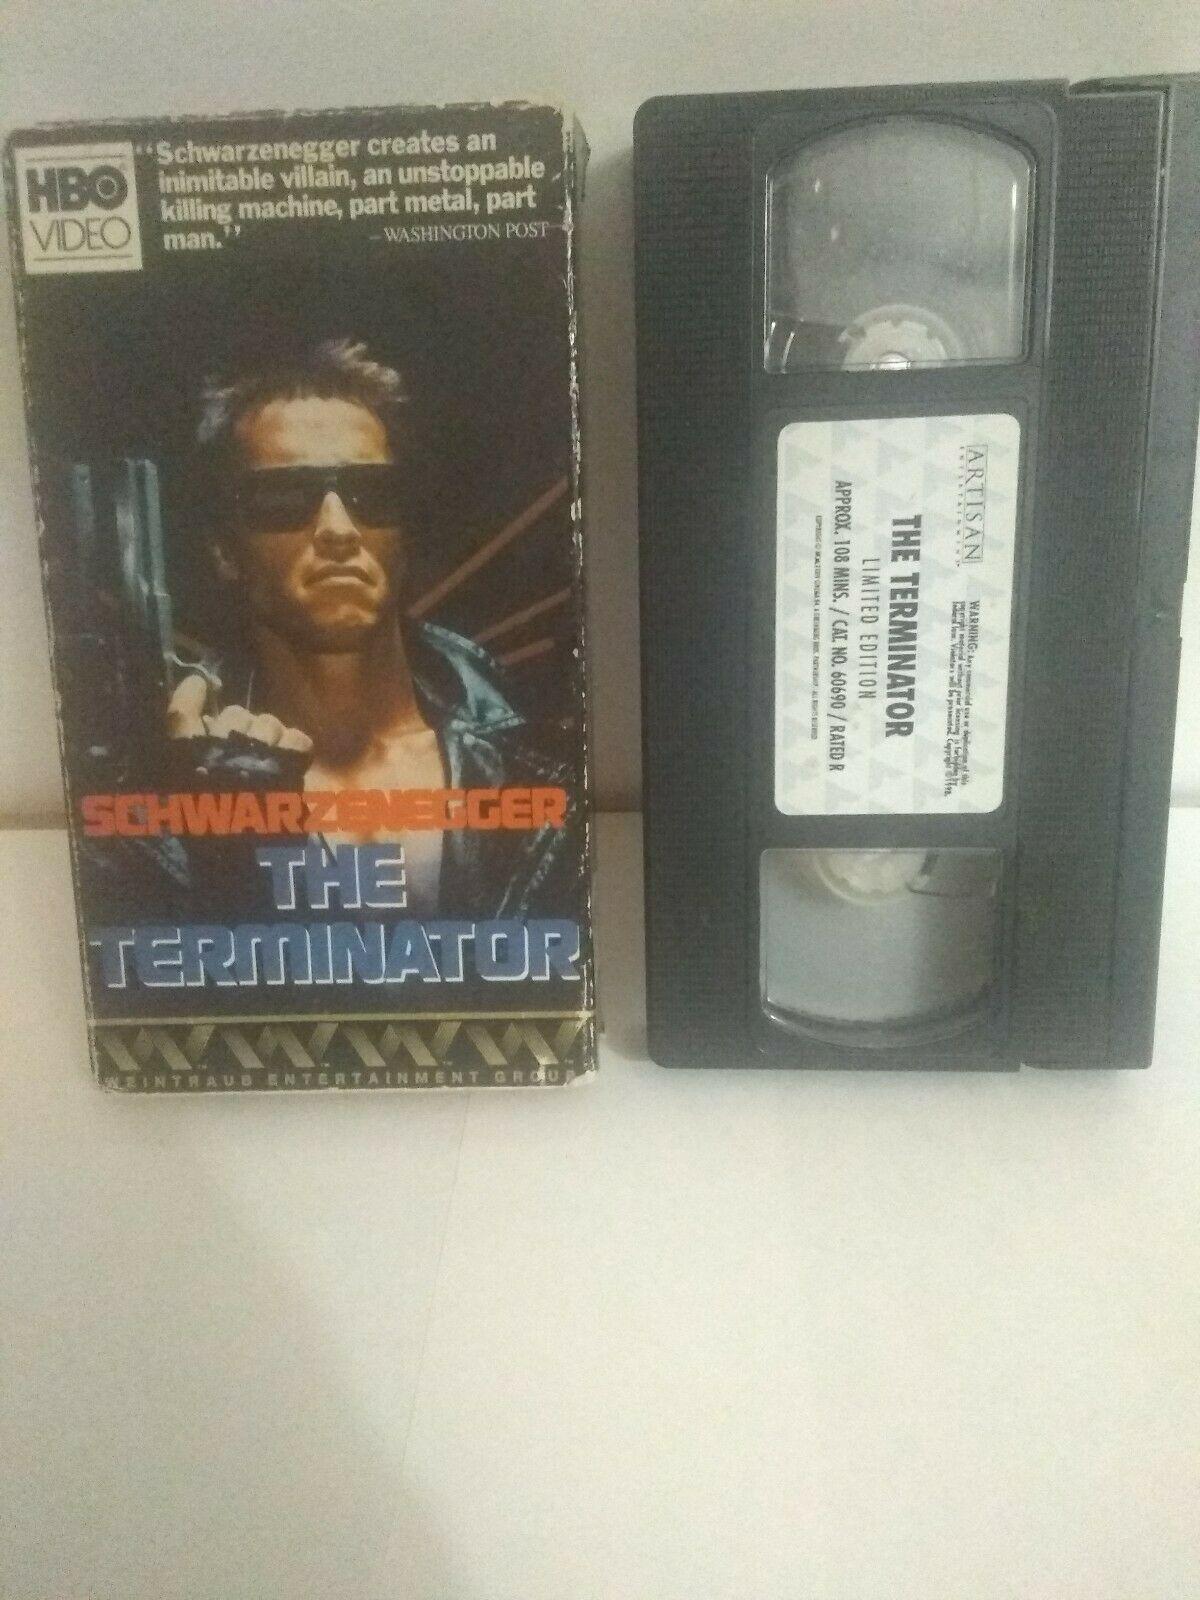 The Terminator (home video release)